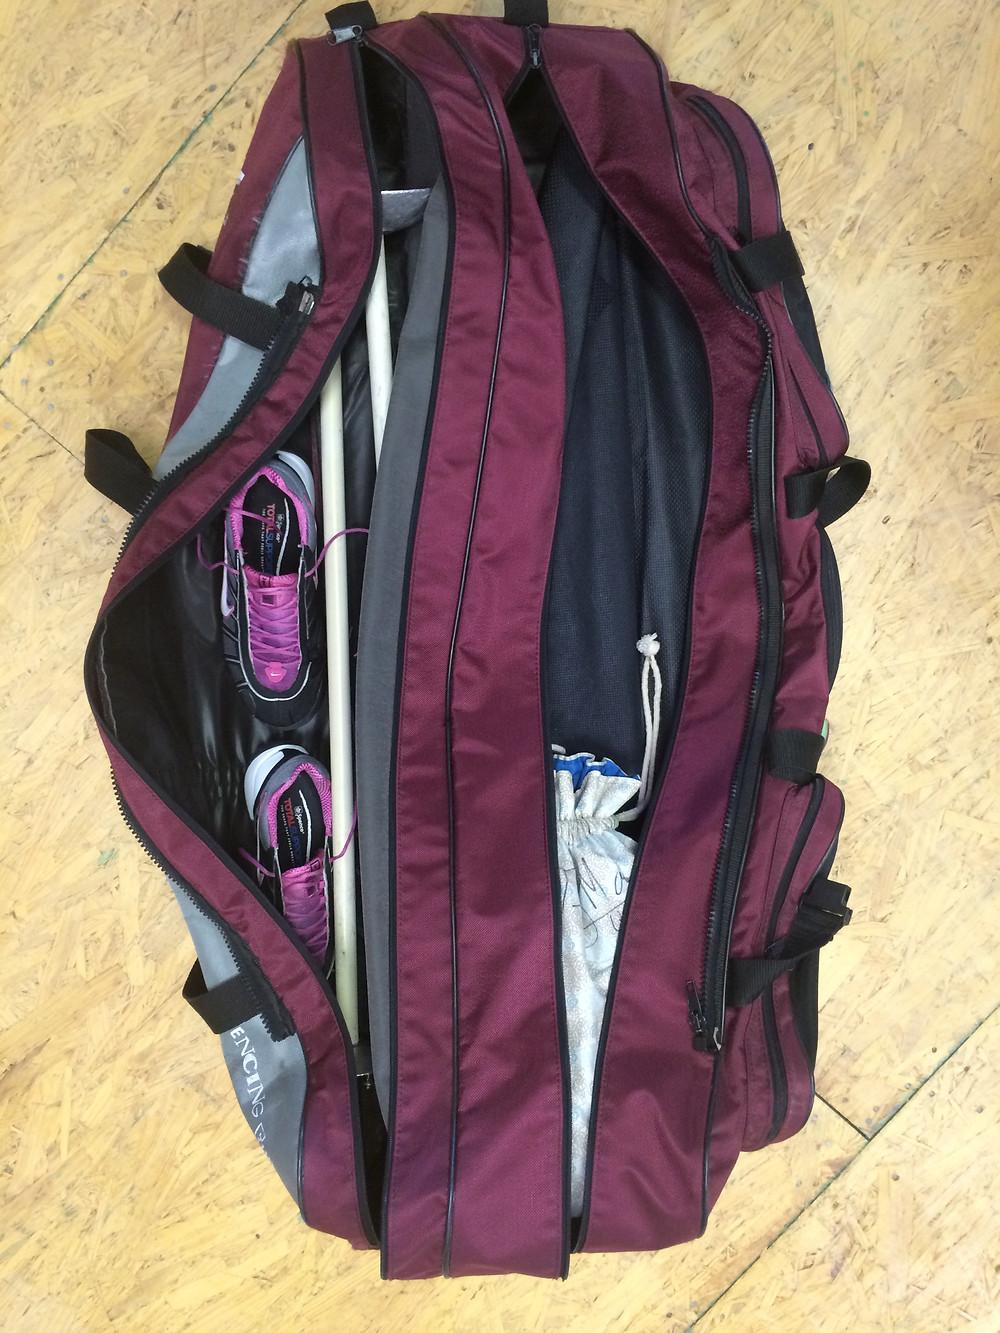 All gear in fencing bag